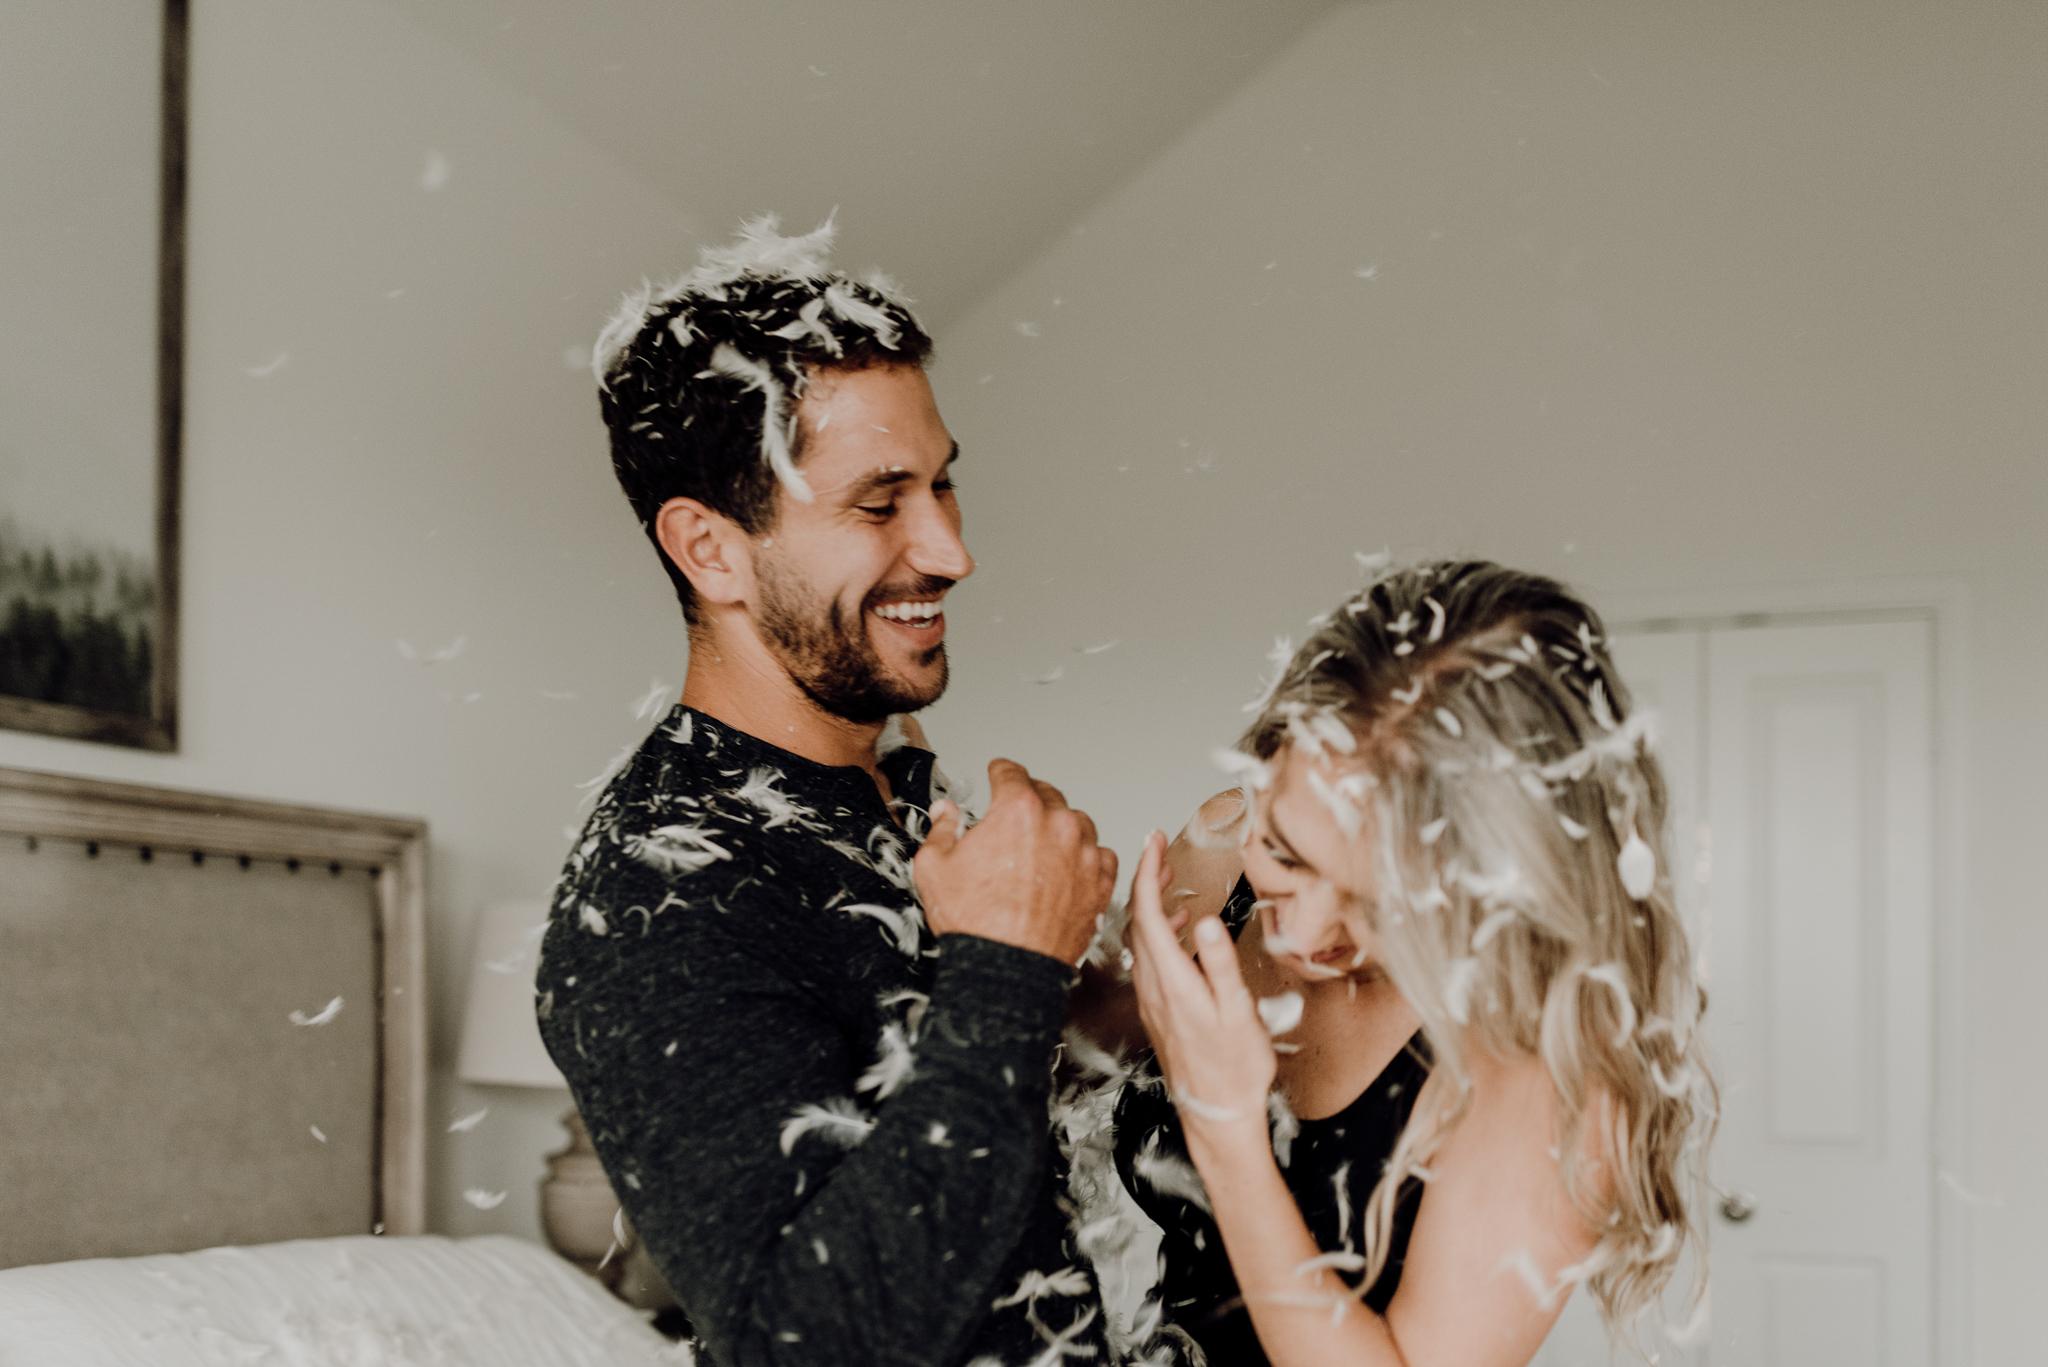 Houston Wedding Photographer-Houston In Home Engagement Session- Houston Wedding Photographer -Kristen Giles Photography-28.jpg